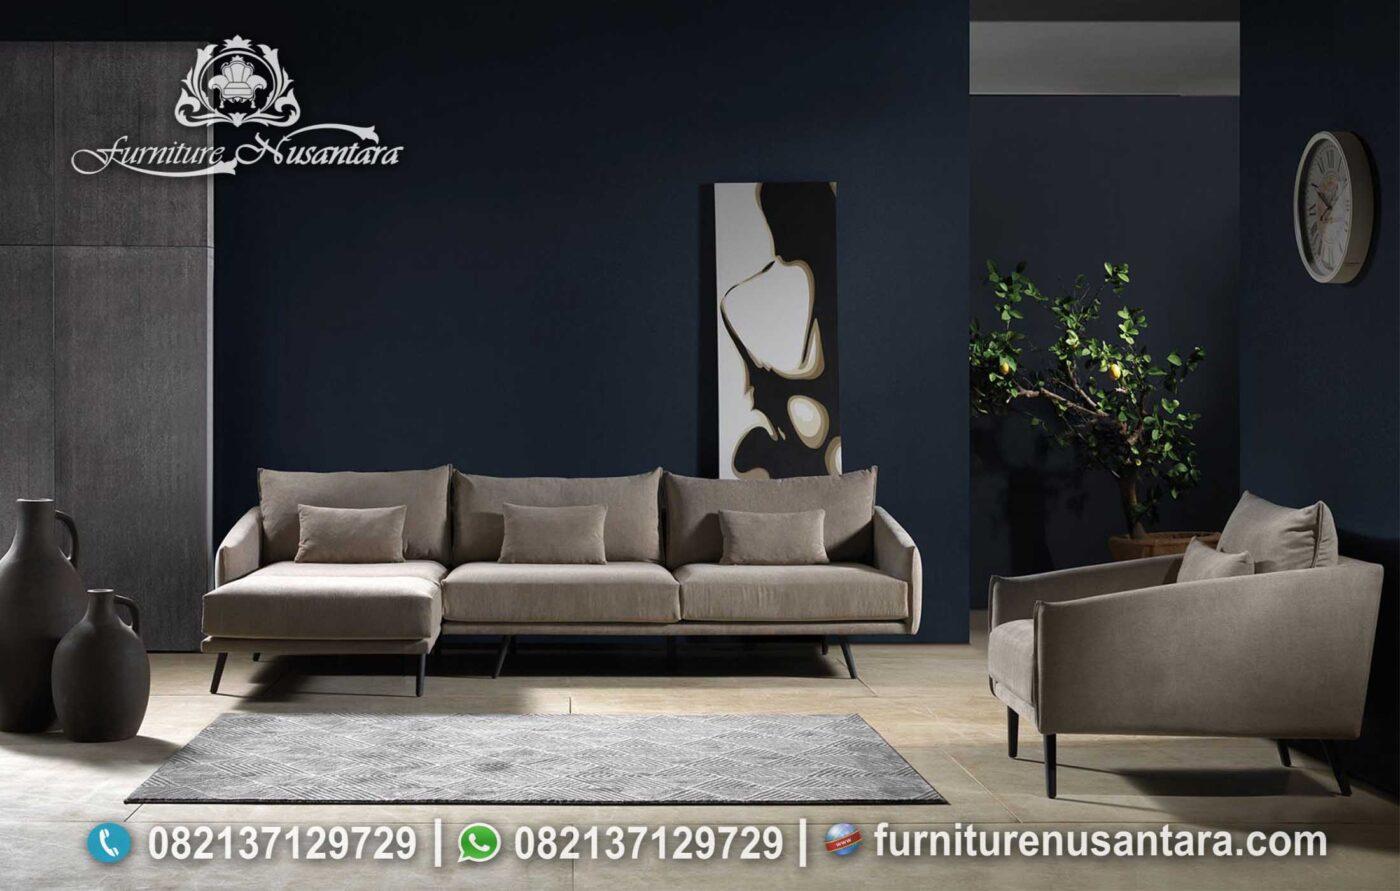 Jual Sofa Minimalis Modern Bandung ST-24, Furniture Nusantara